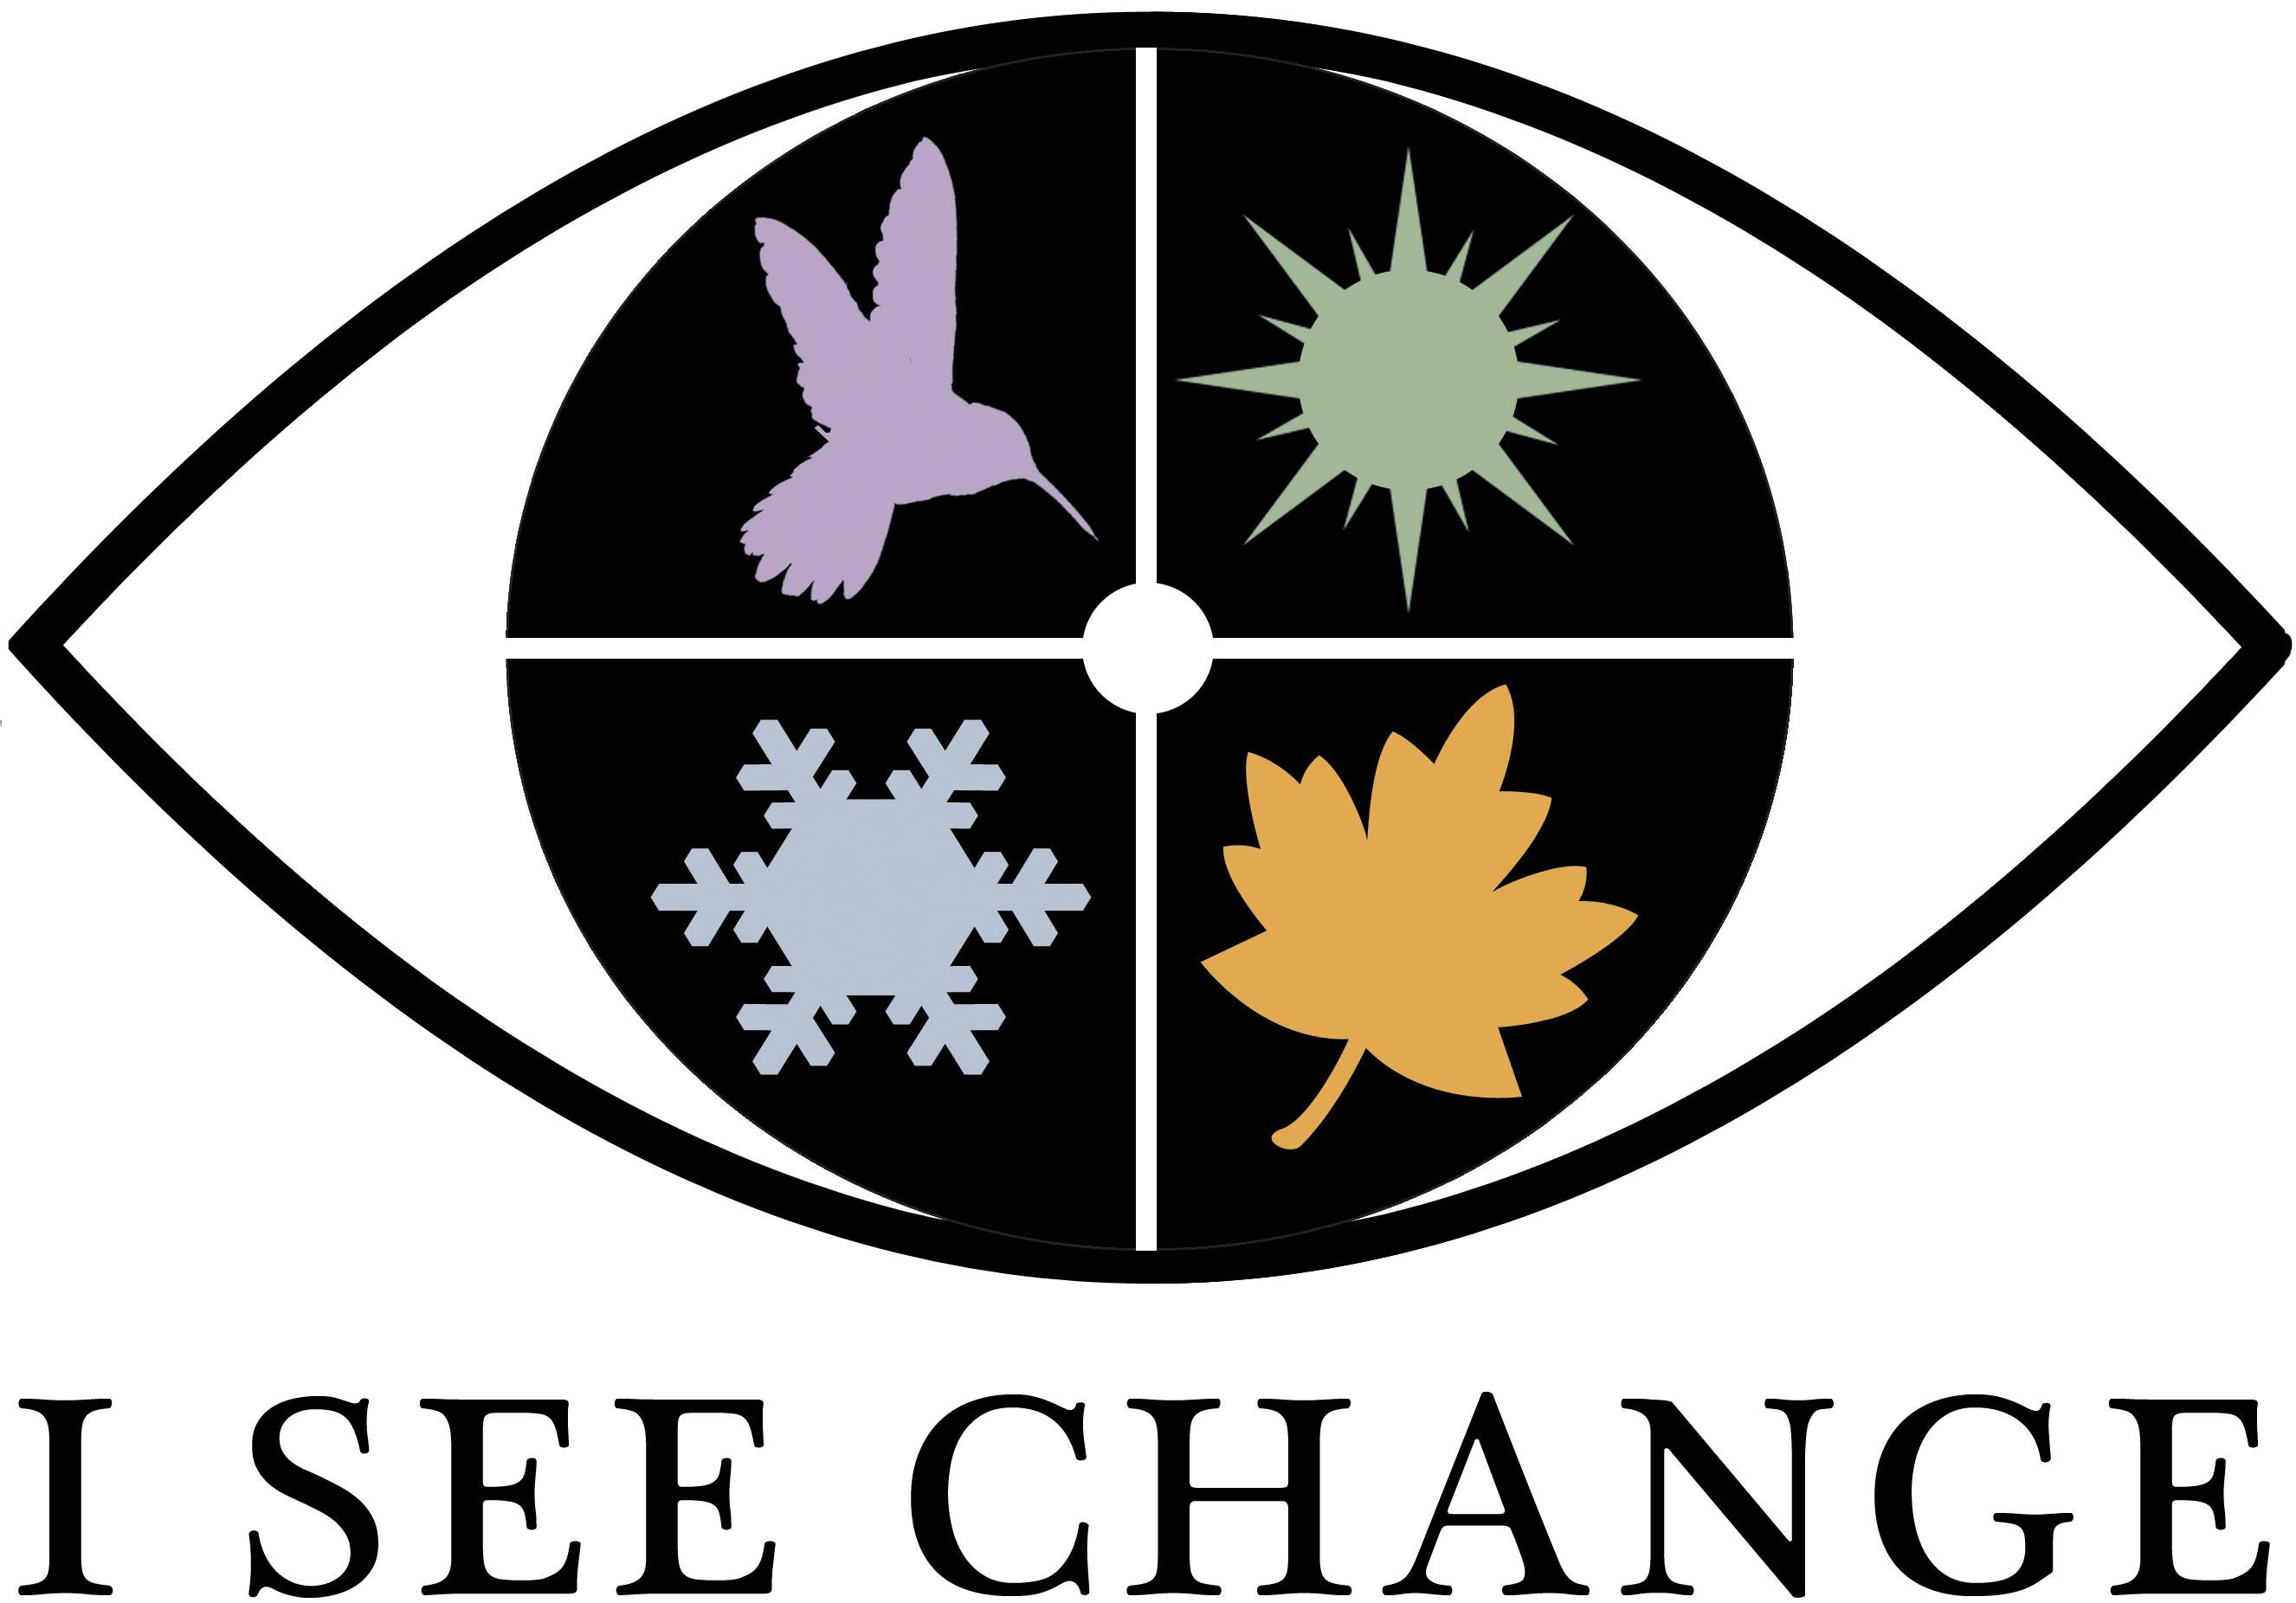 iSeeChange National Picks Up Steam